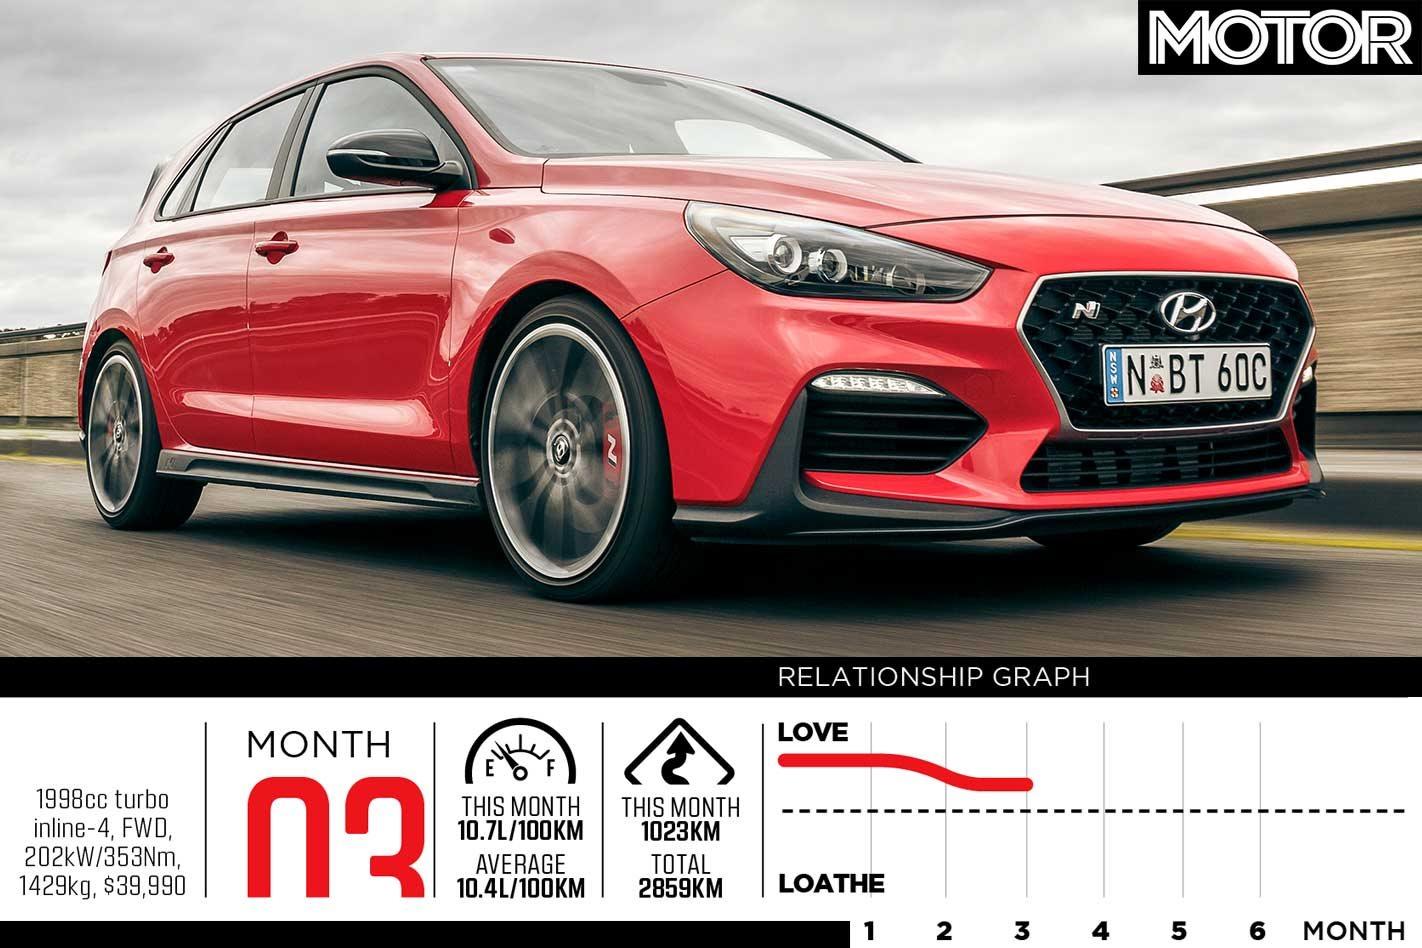 2018 Hyundai i30 N long-term review: Part 3